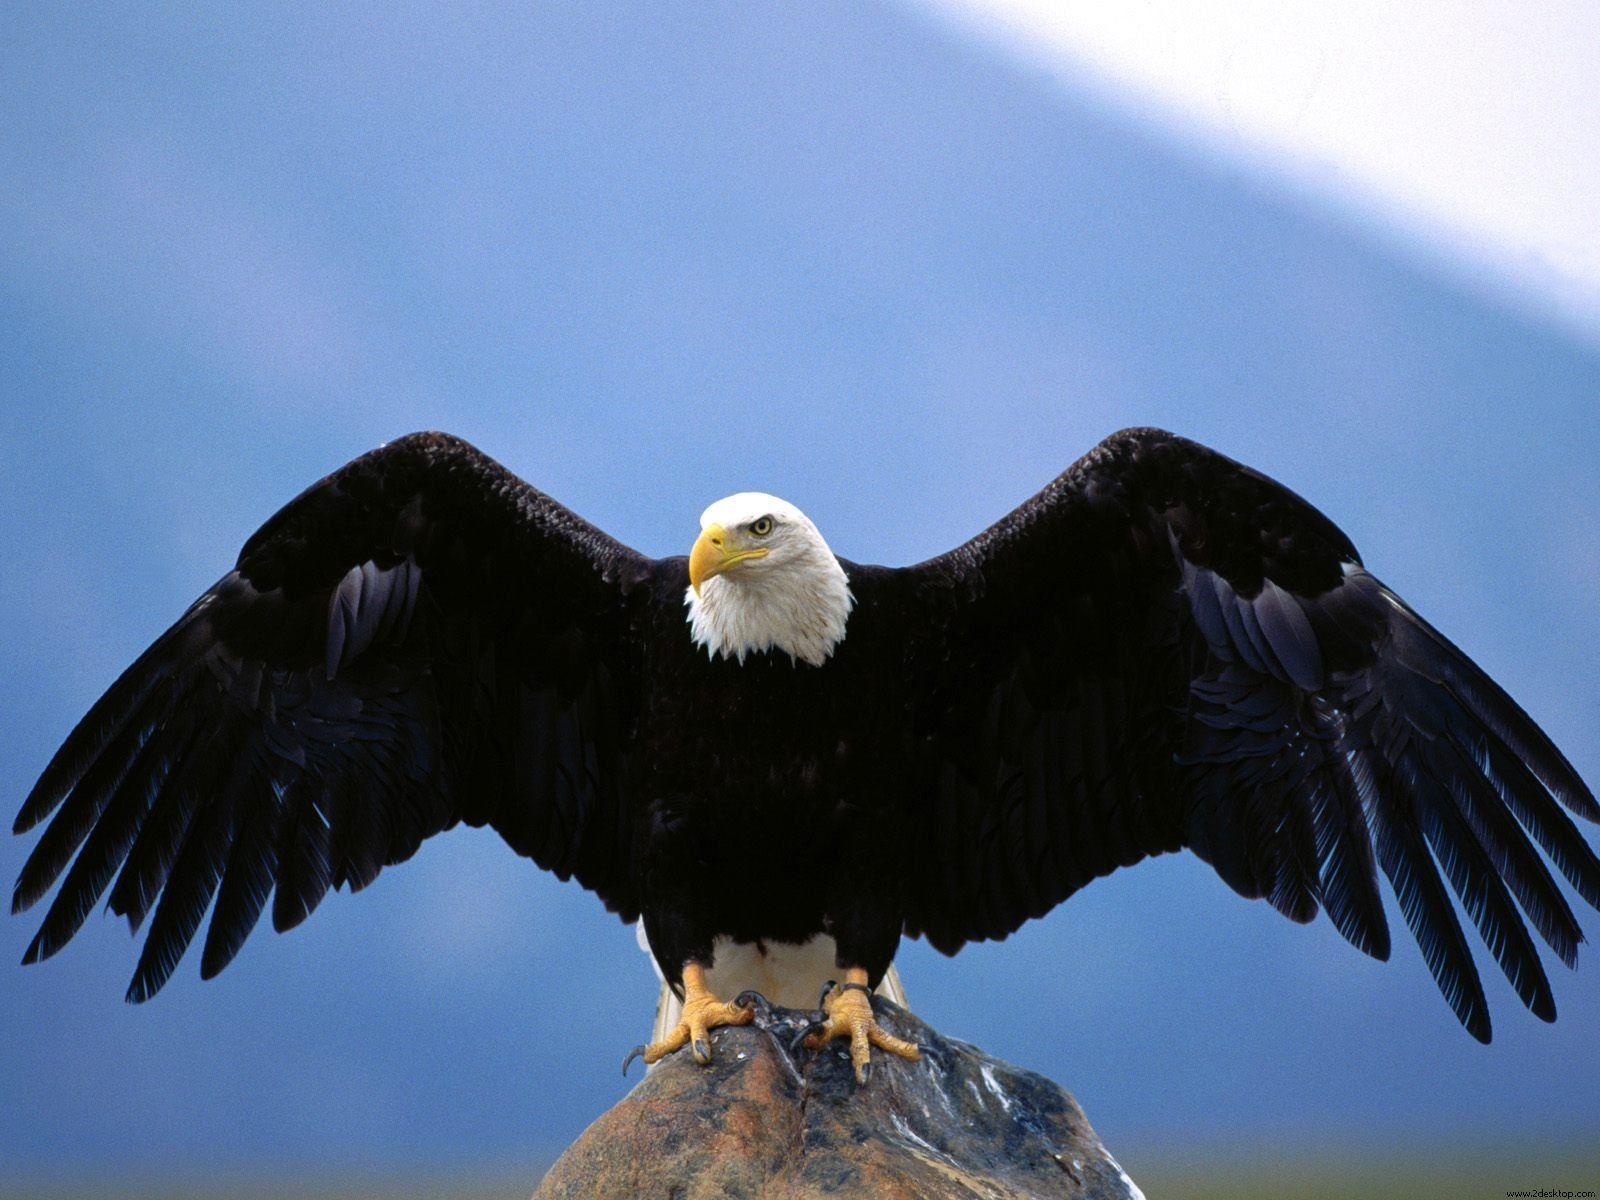 Eagle Desktop Wallpaper: Eagle Wallpapers Hd Free Download #9262 ...